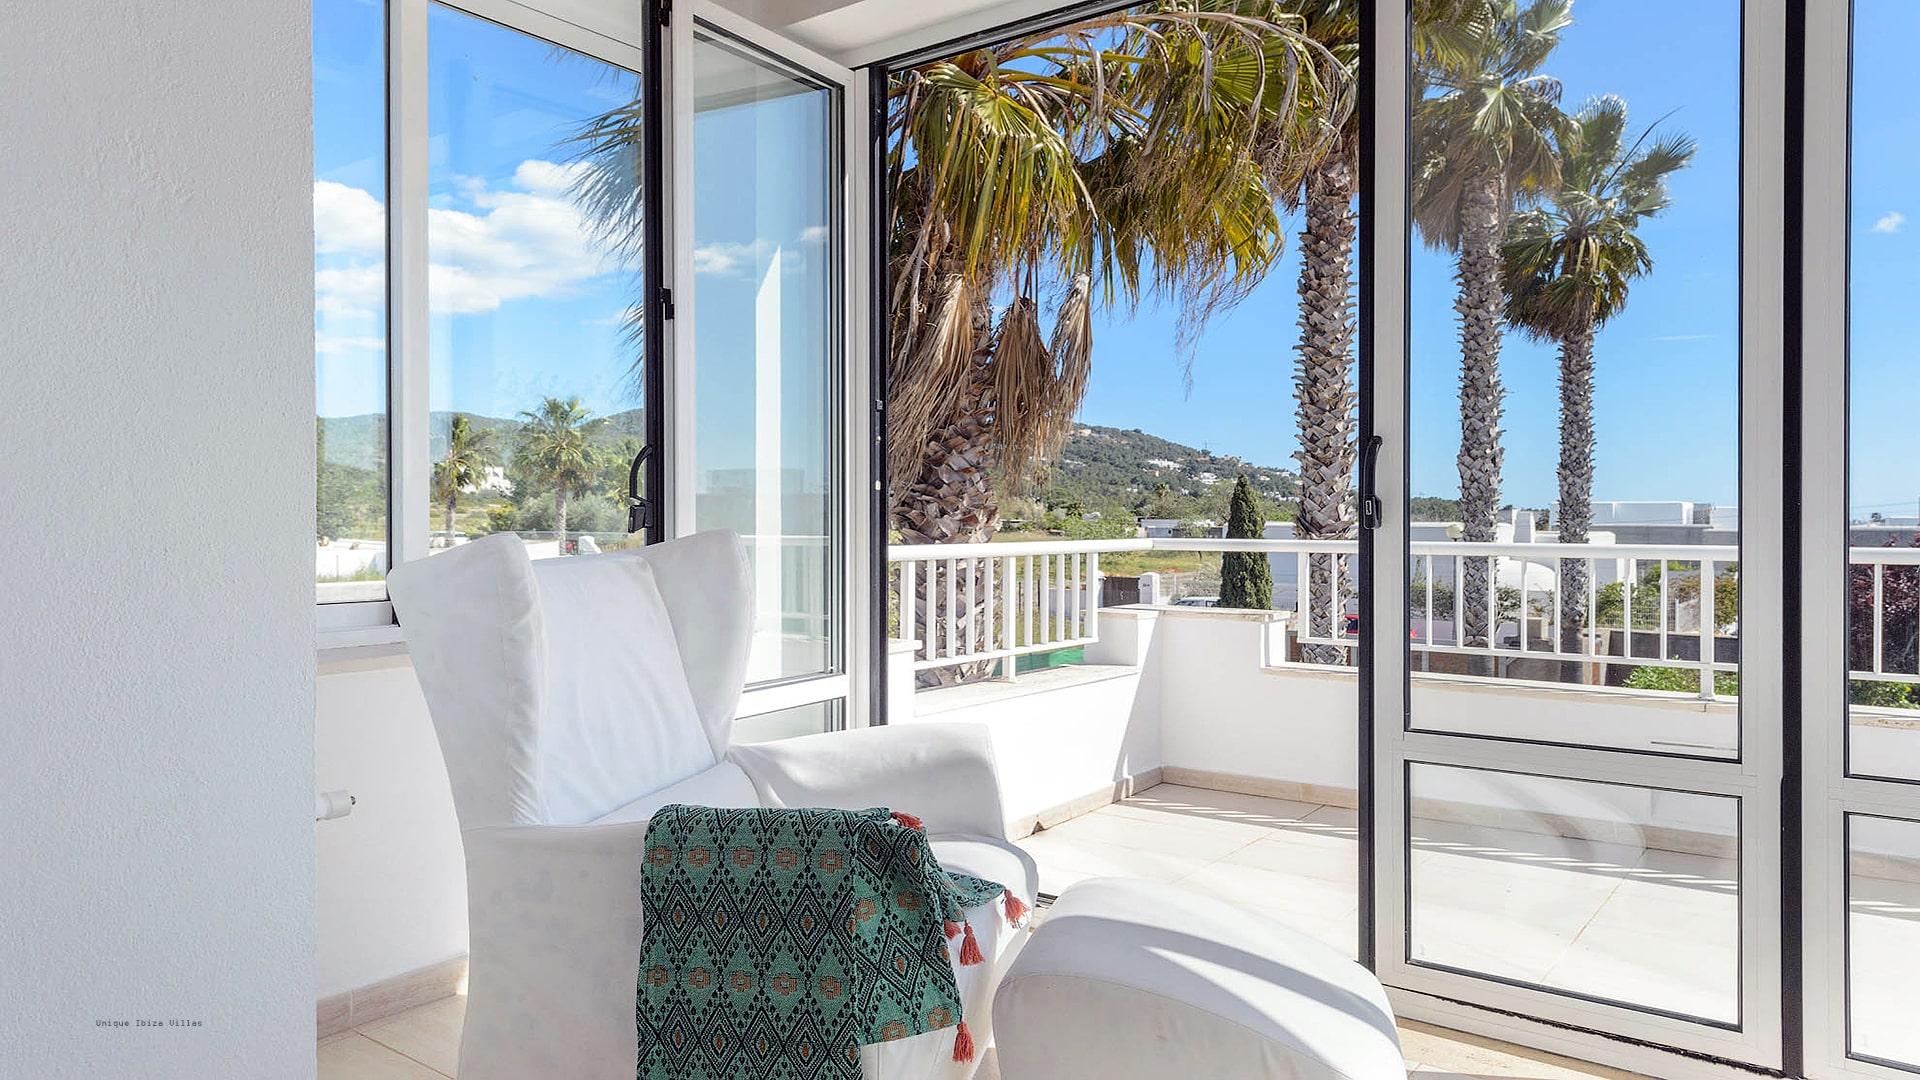 Villa Can Fluxa Ibiza 35 Bedroom 1